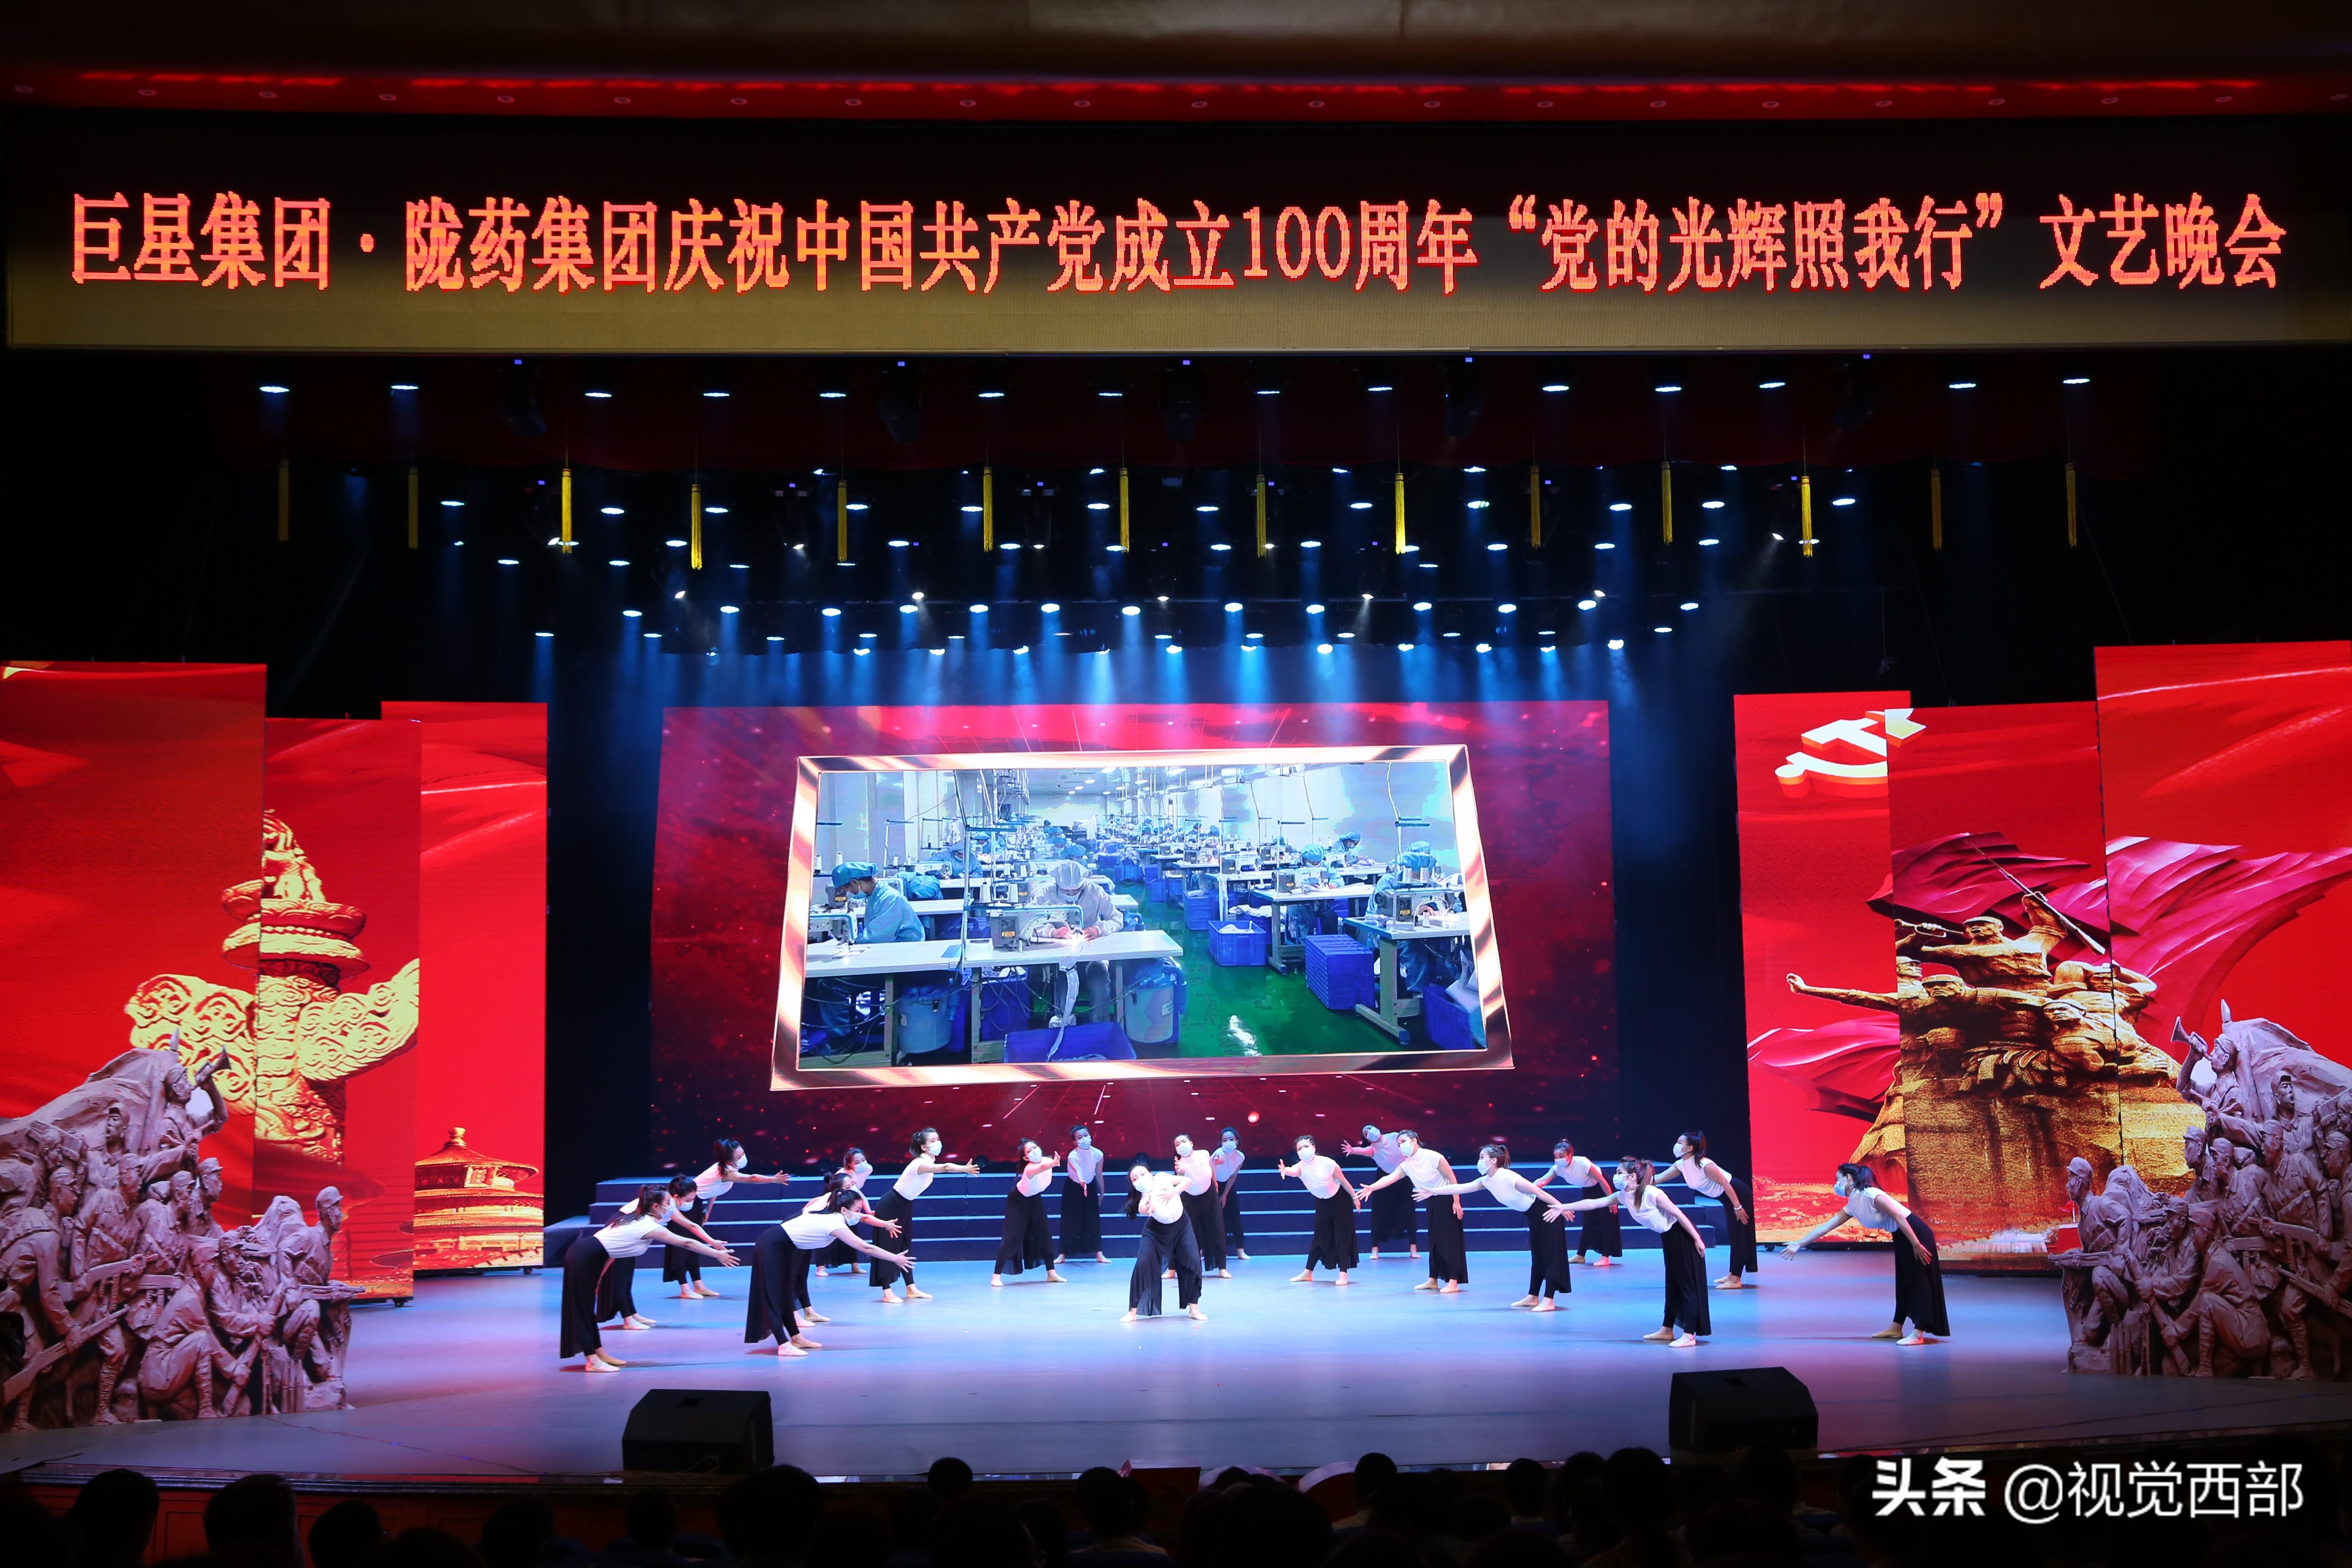 350vip葡亰集团、陇药集团庆祝建党100周年文艺晚会成功举办